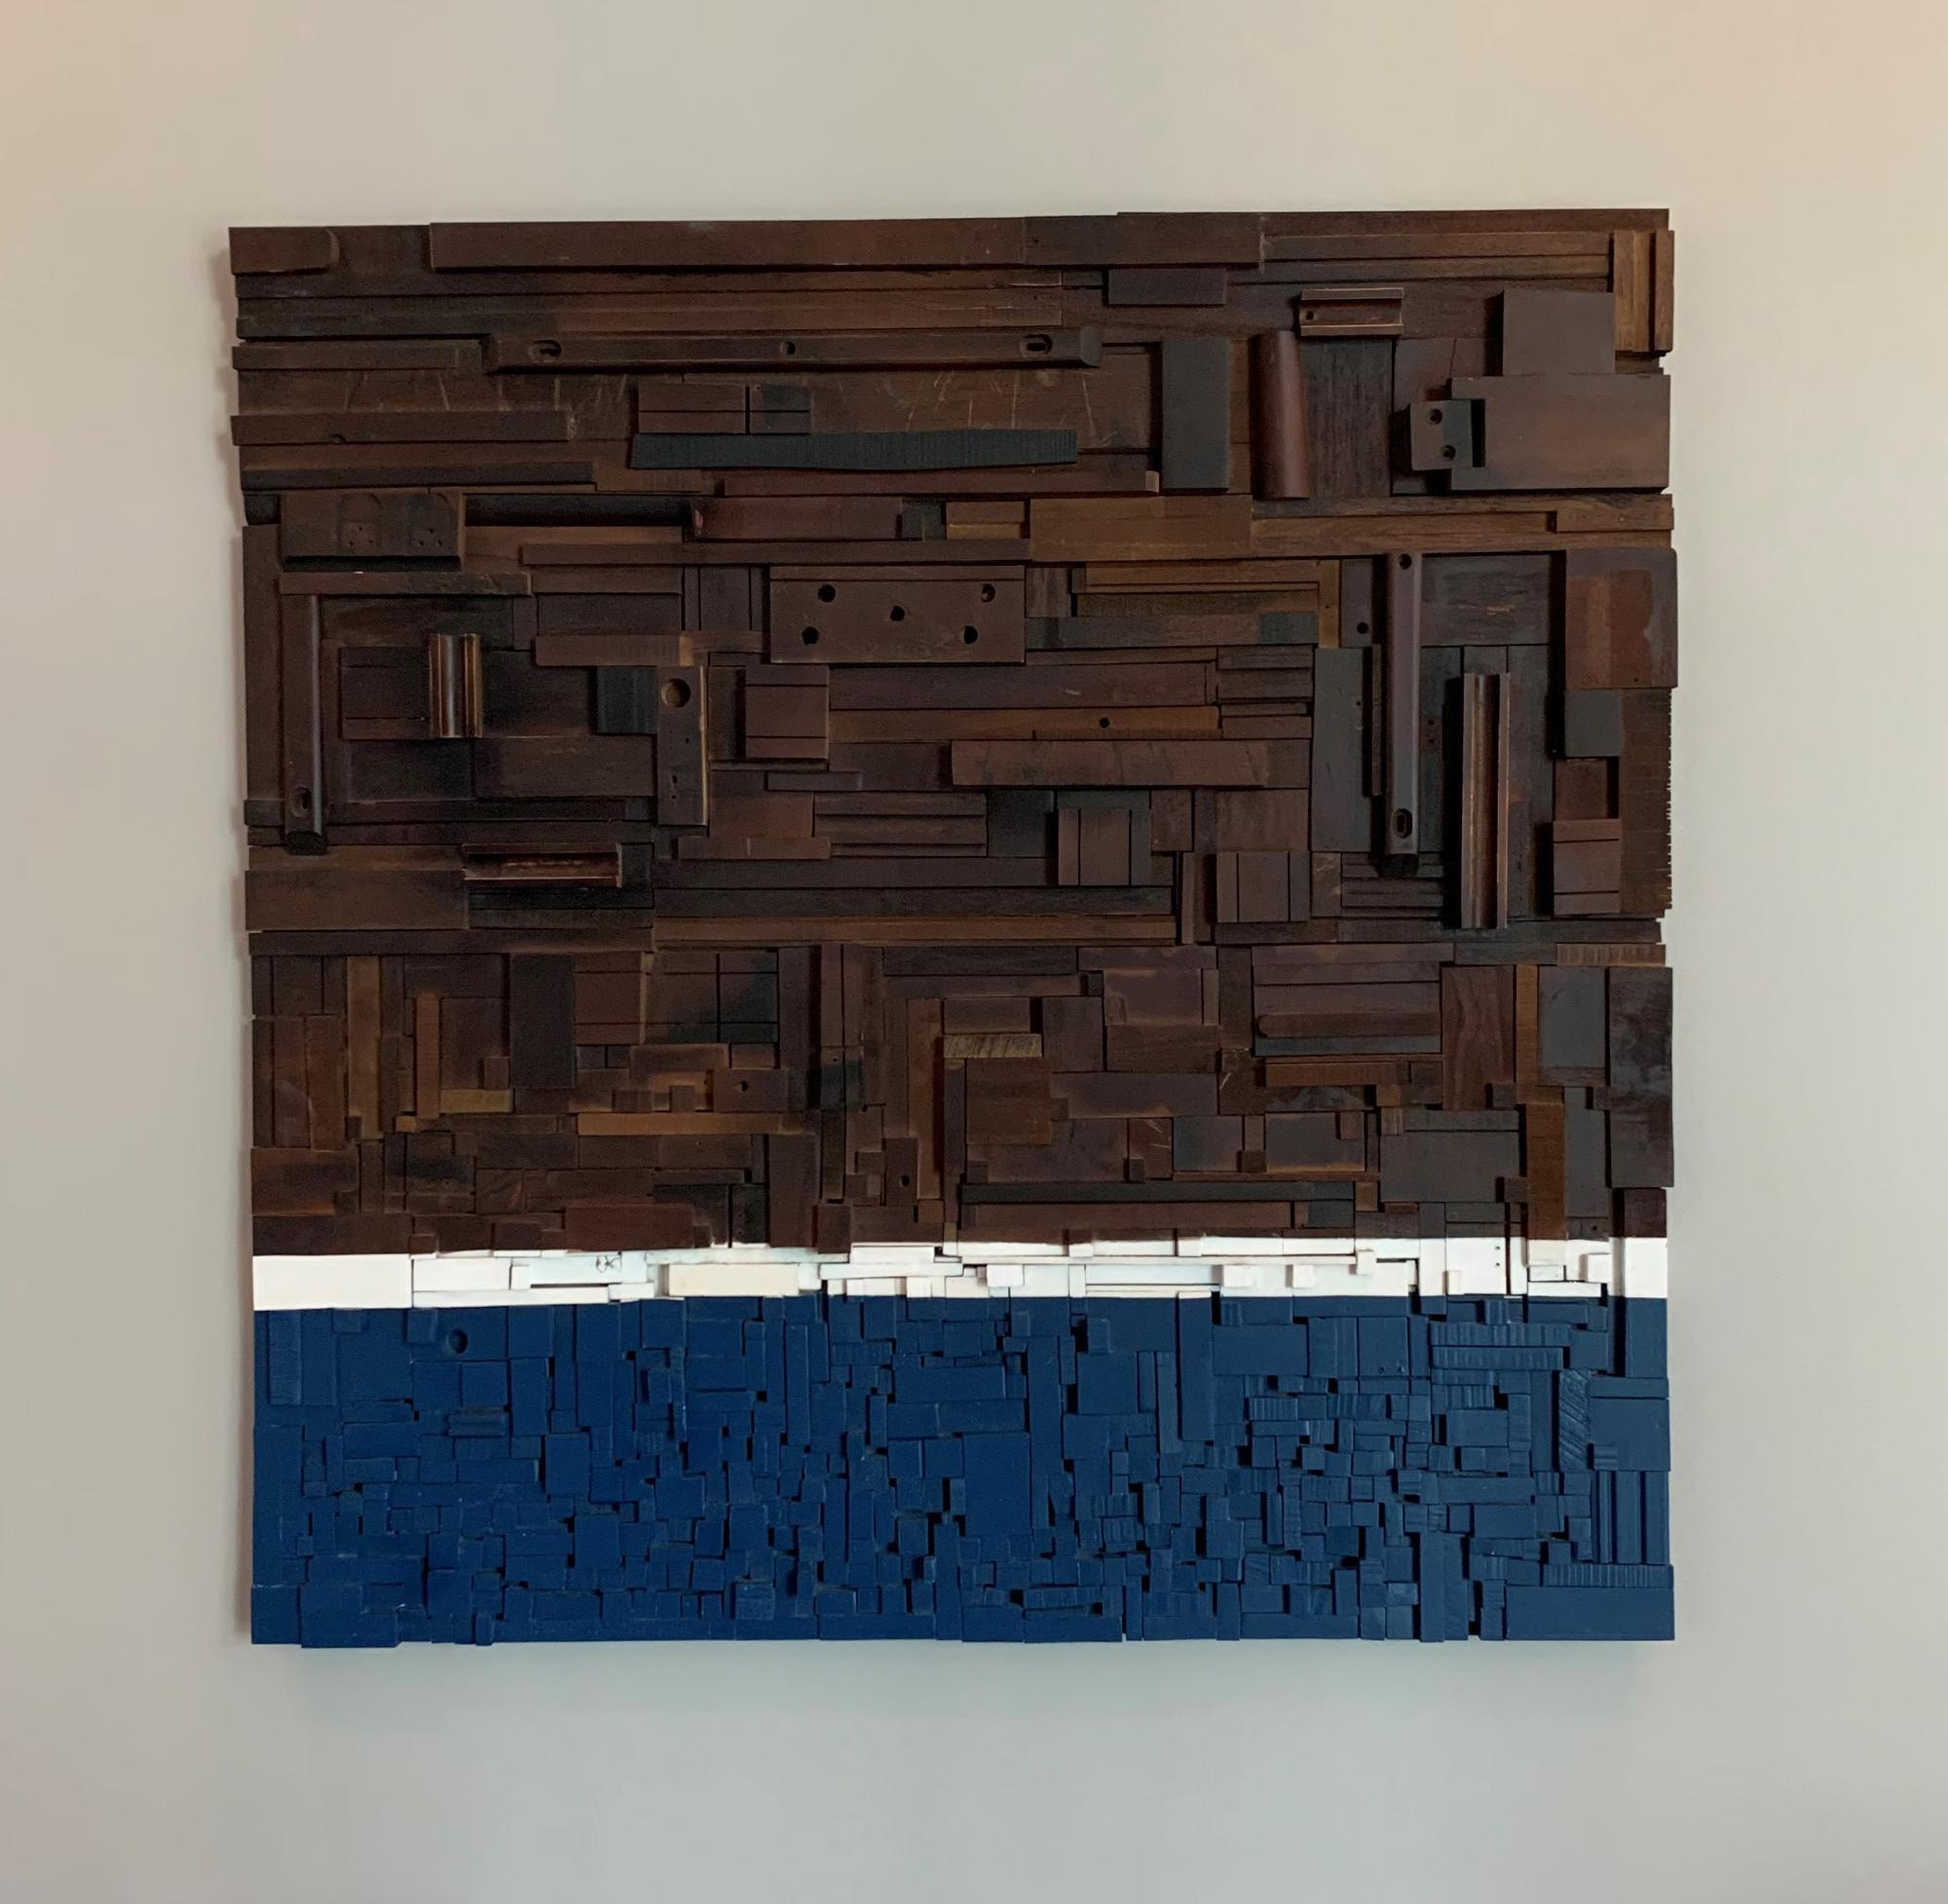 NEMA Chicago Abstract